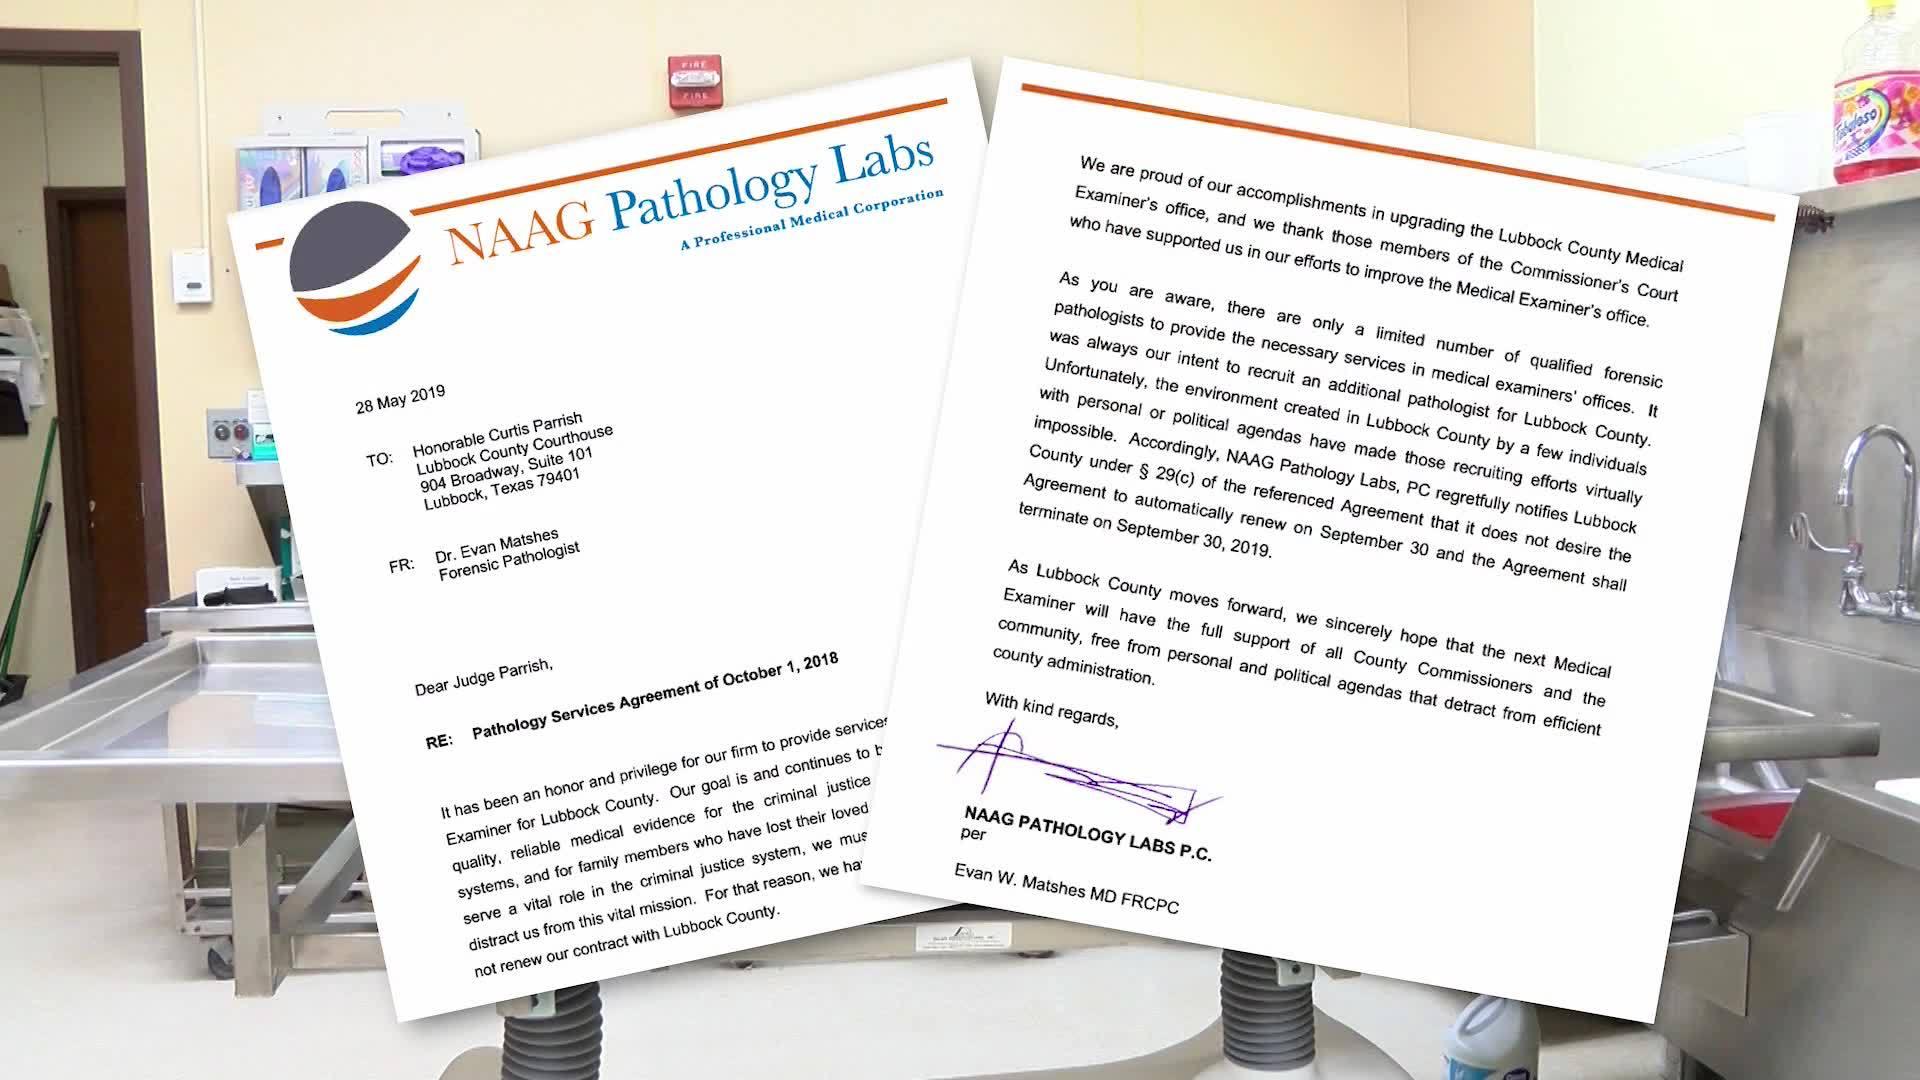 NAAG_Pathology_Labs_8_20190529032030